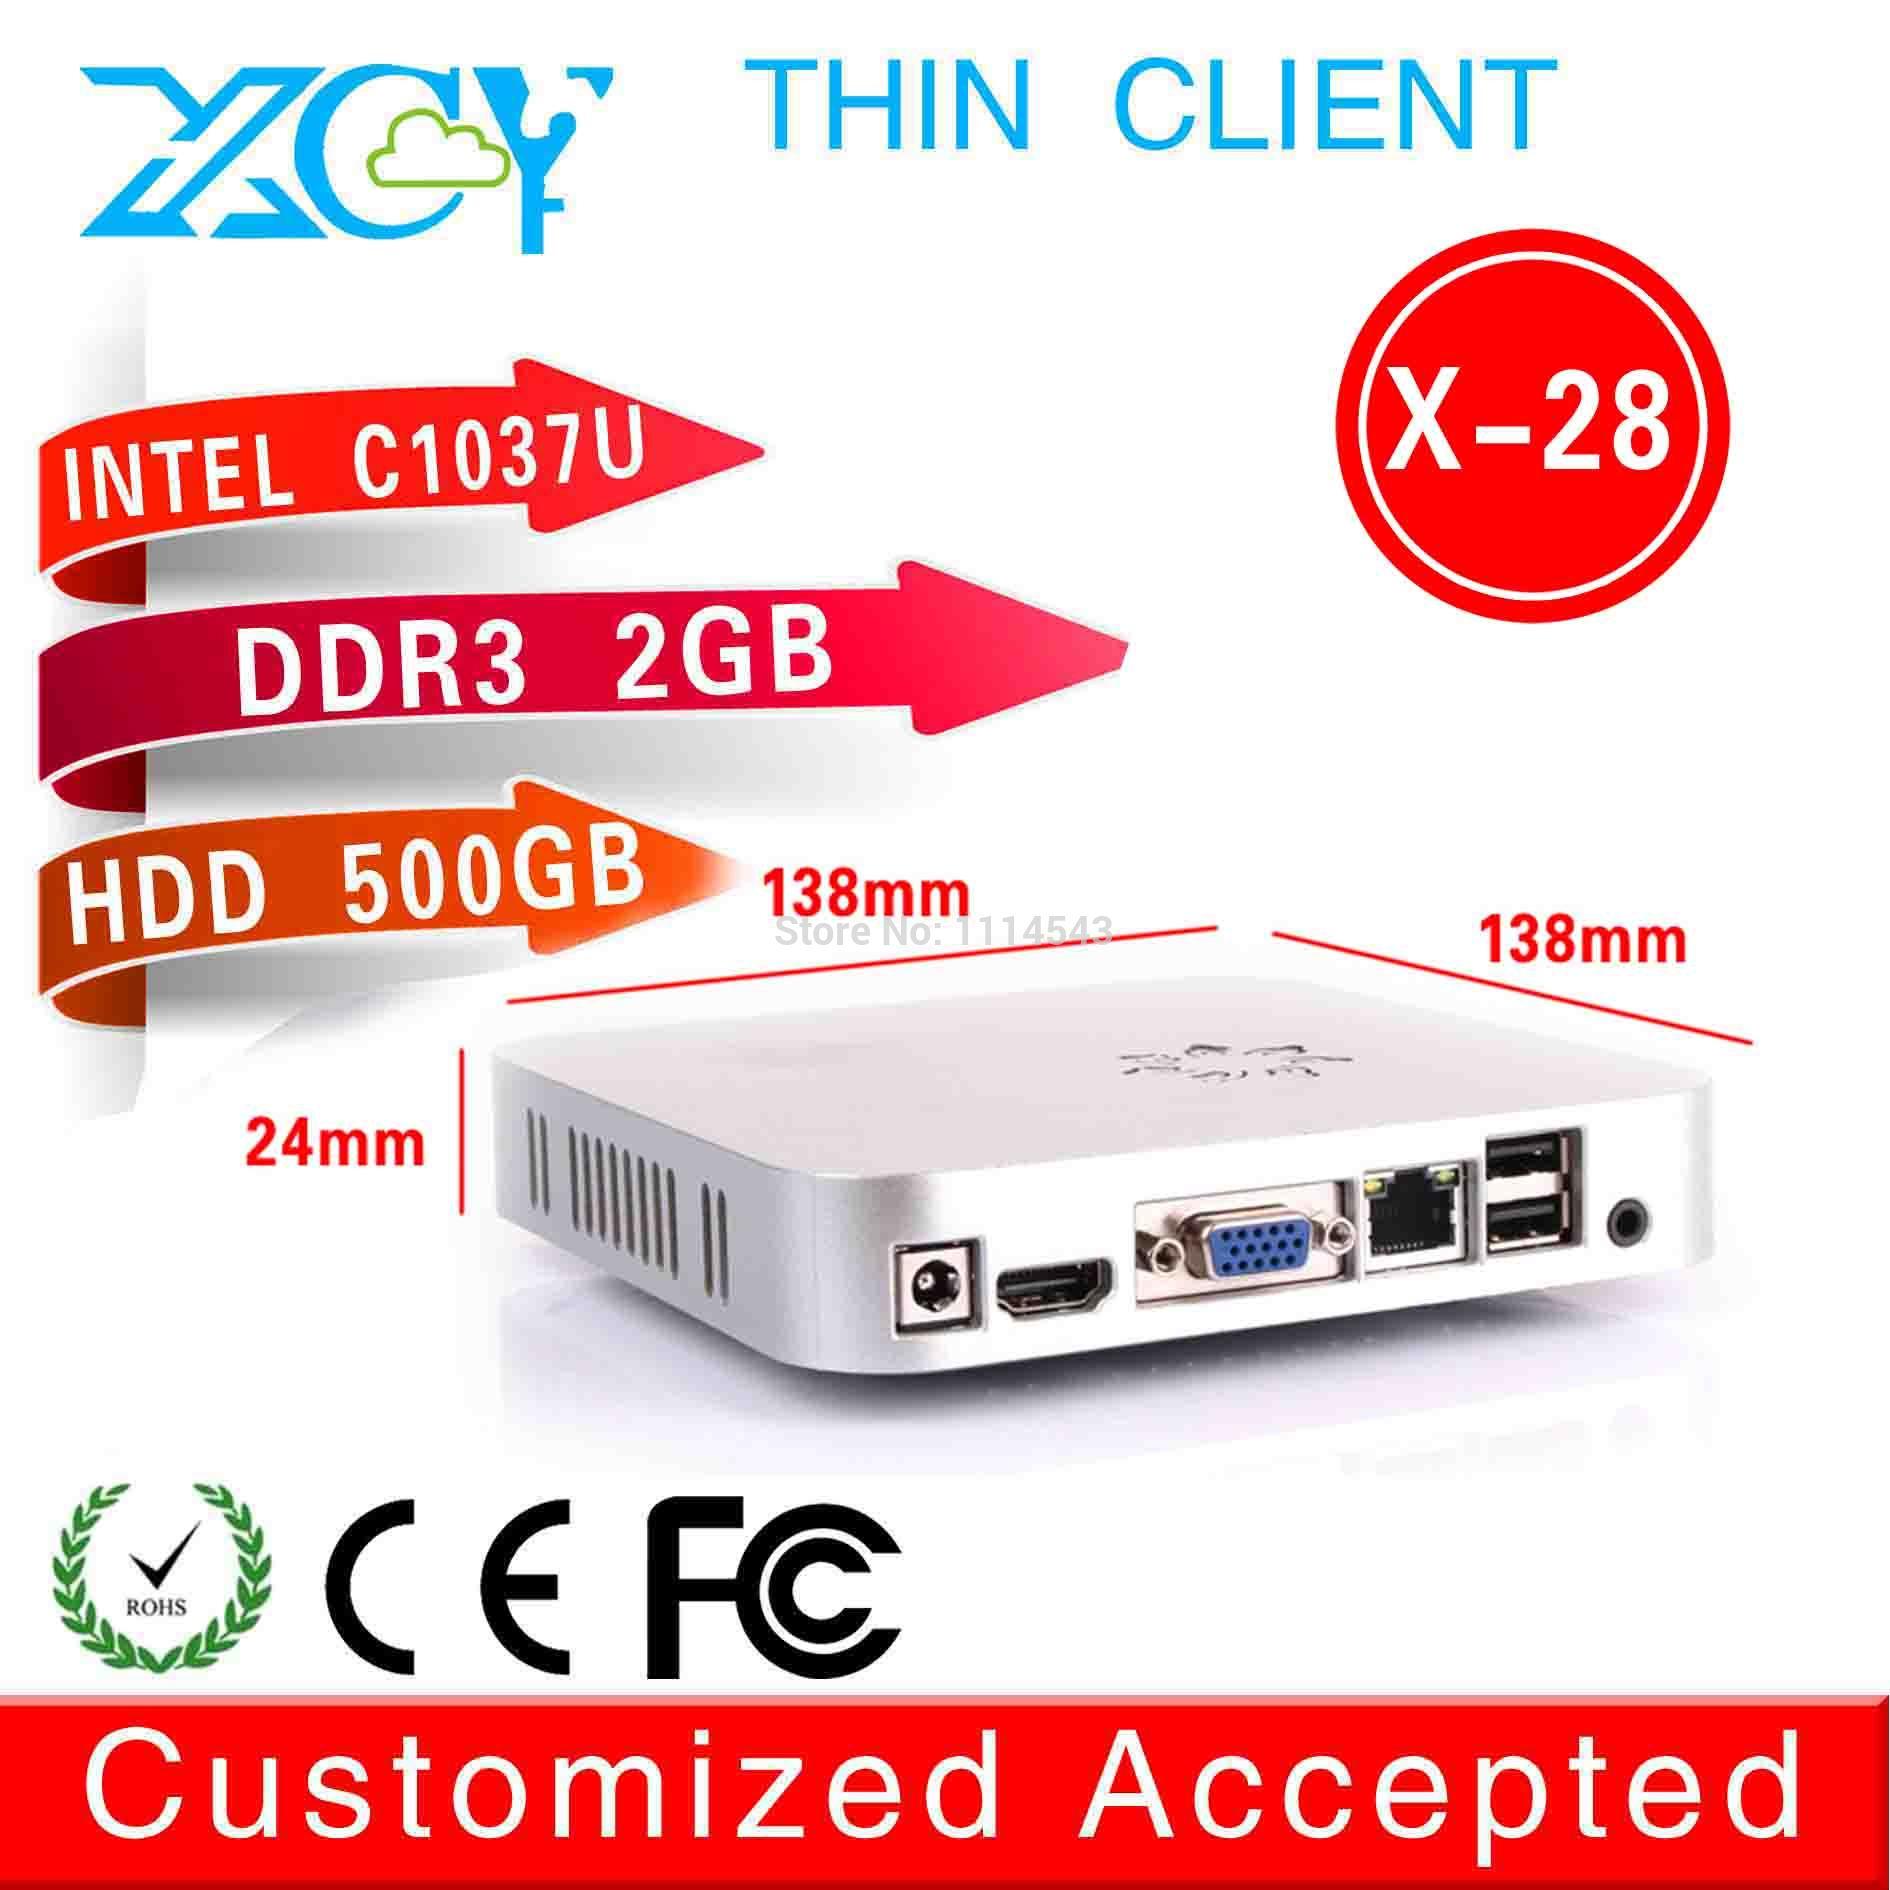 pc desktop mini server pc mini pc itx x-28 c1037u 2g ram 500g hdd support win 7 XP system High Performance(China (Mainland))